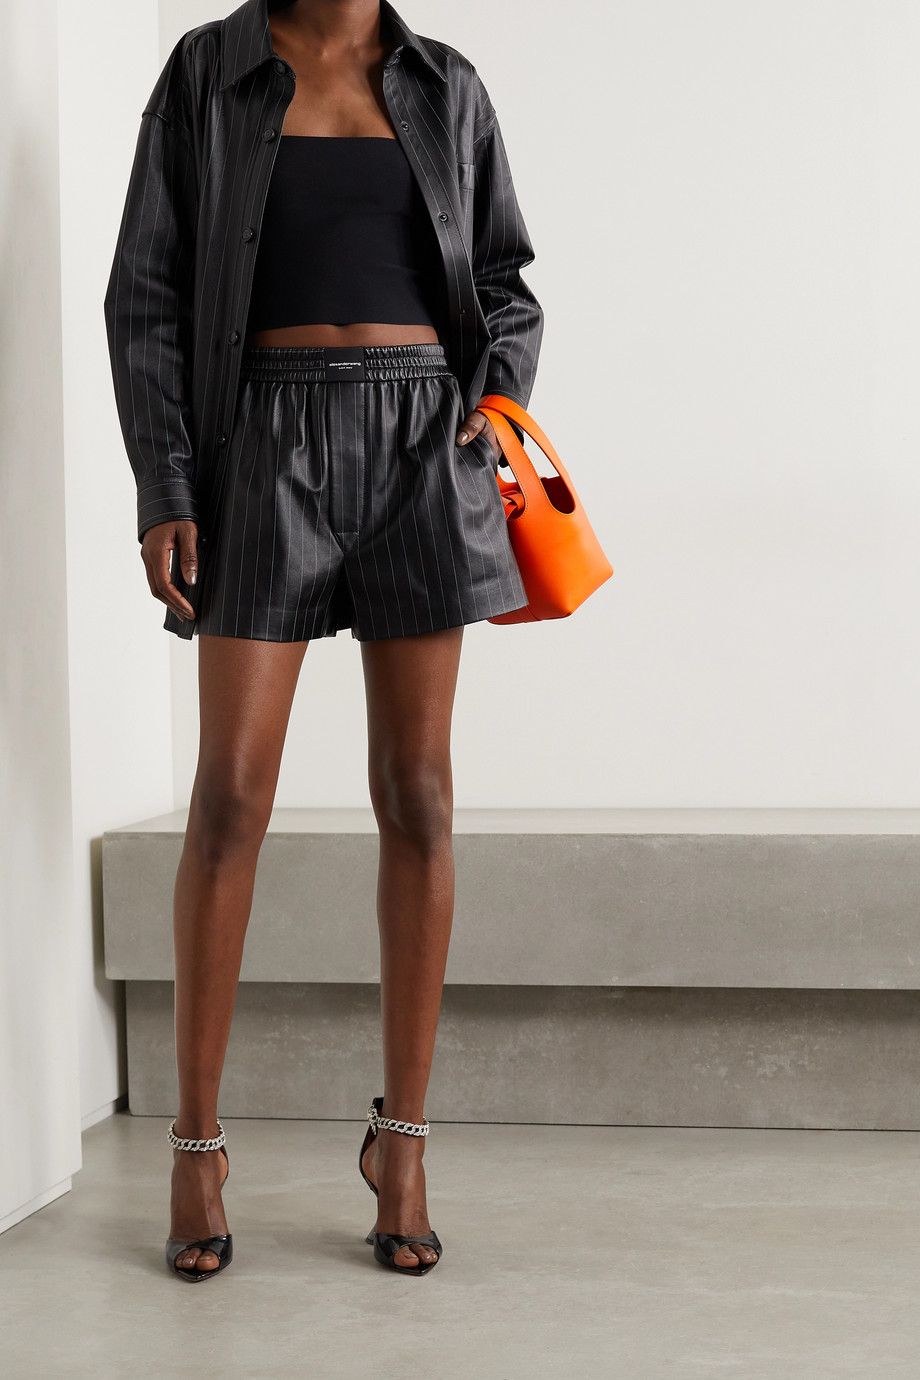 Alexander Wang Pinstriped leather shorts